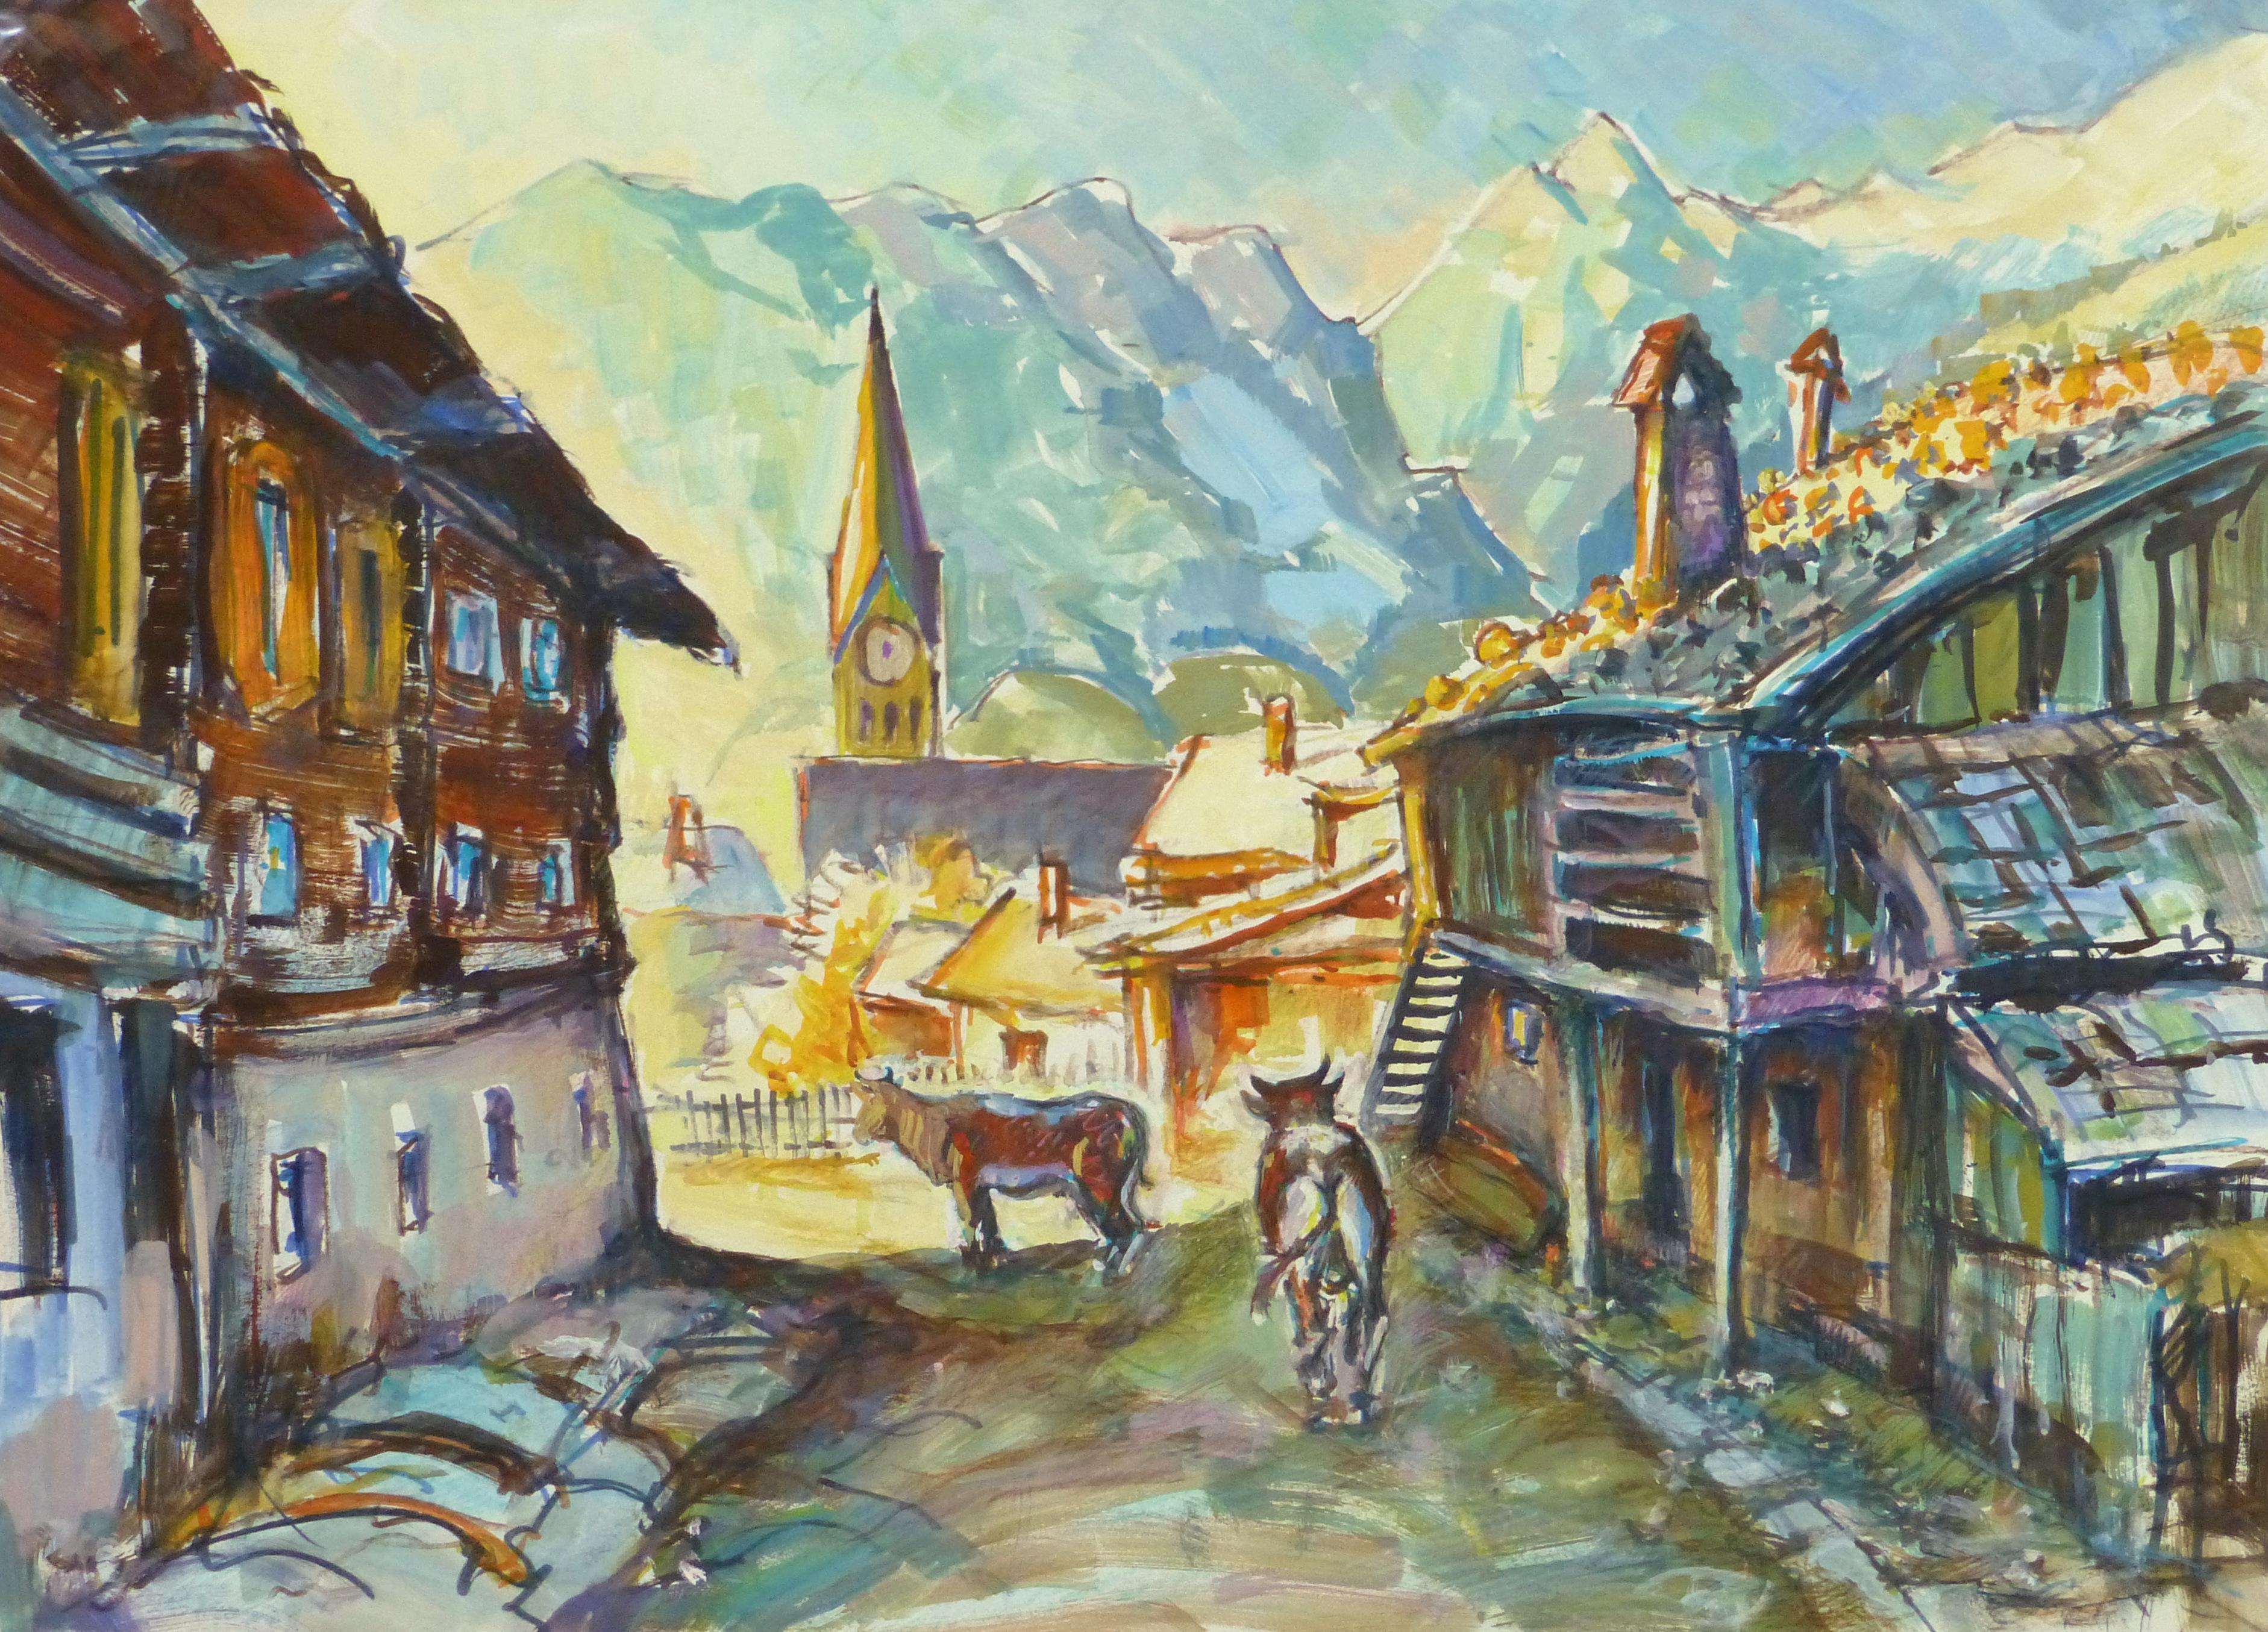 Watercolor Landscape - Rustic Mountain Town, Circa 1950-main-10713M